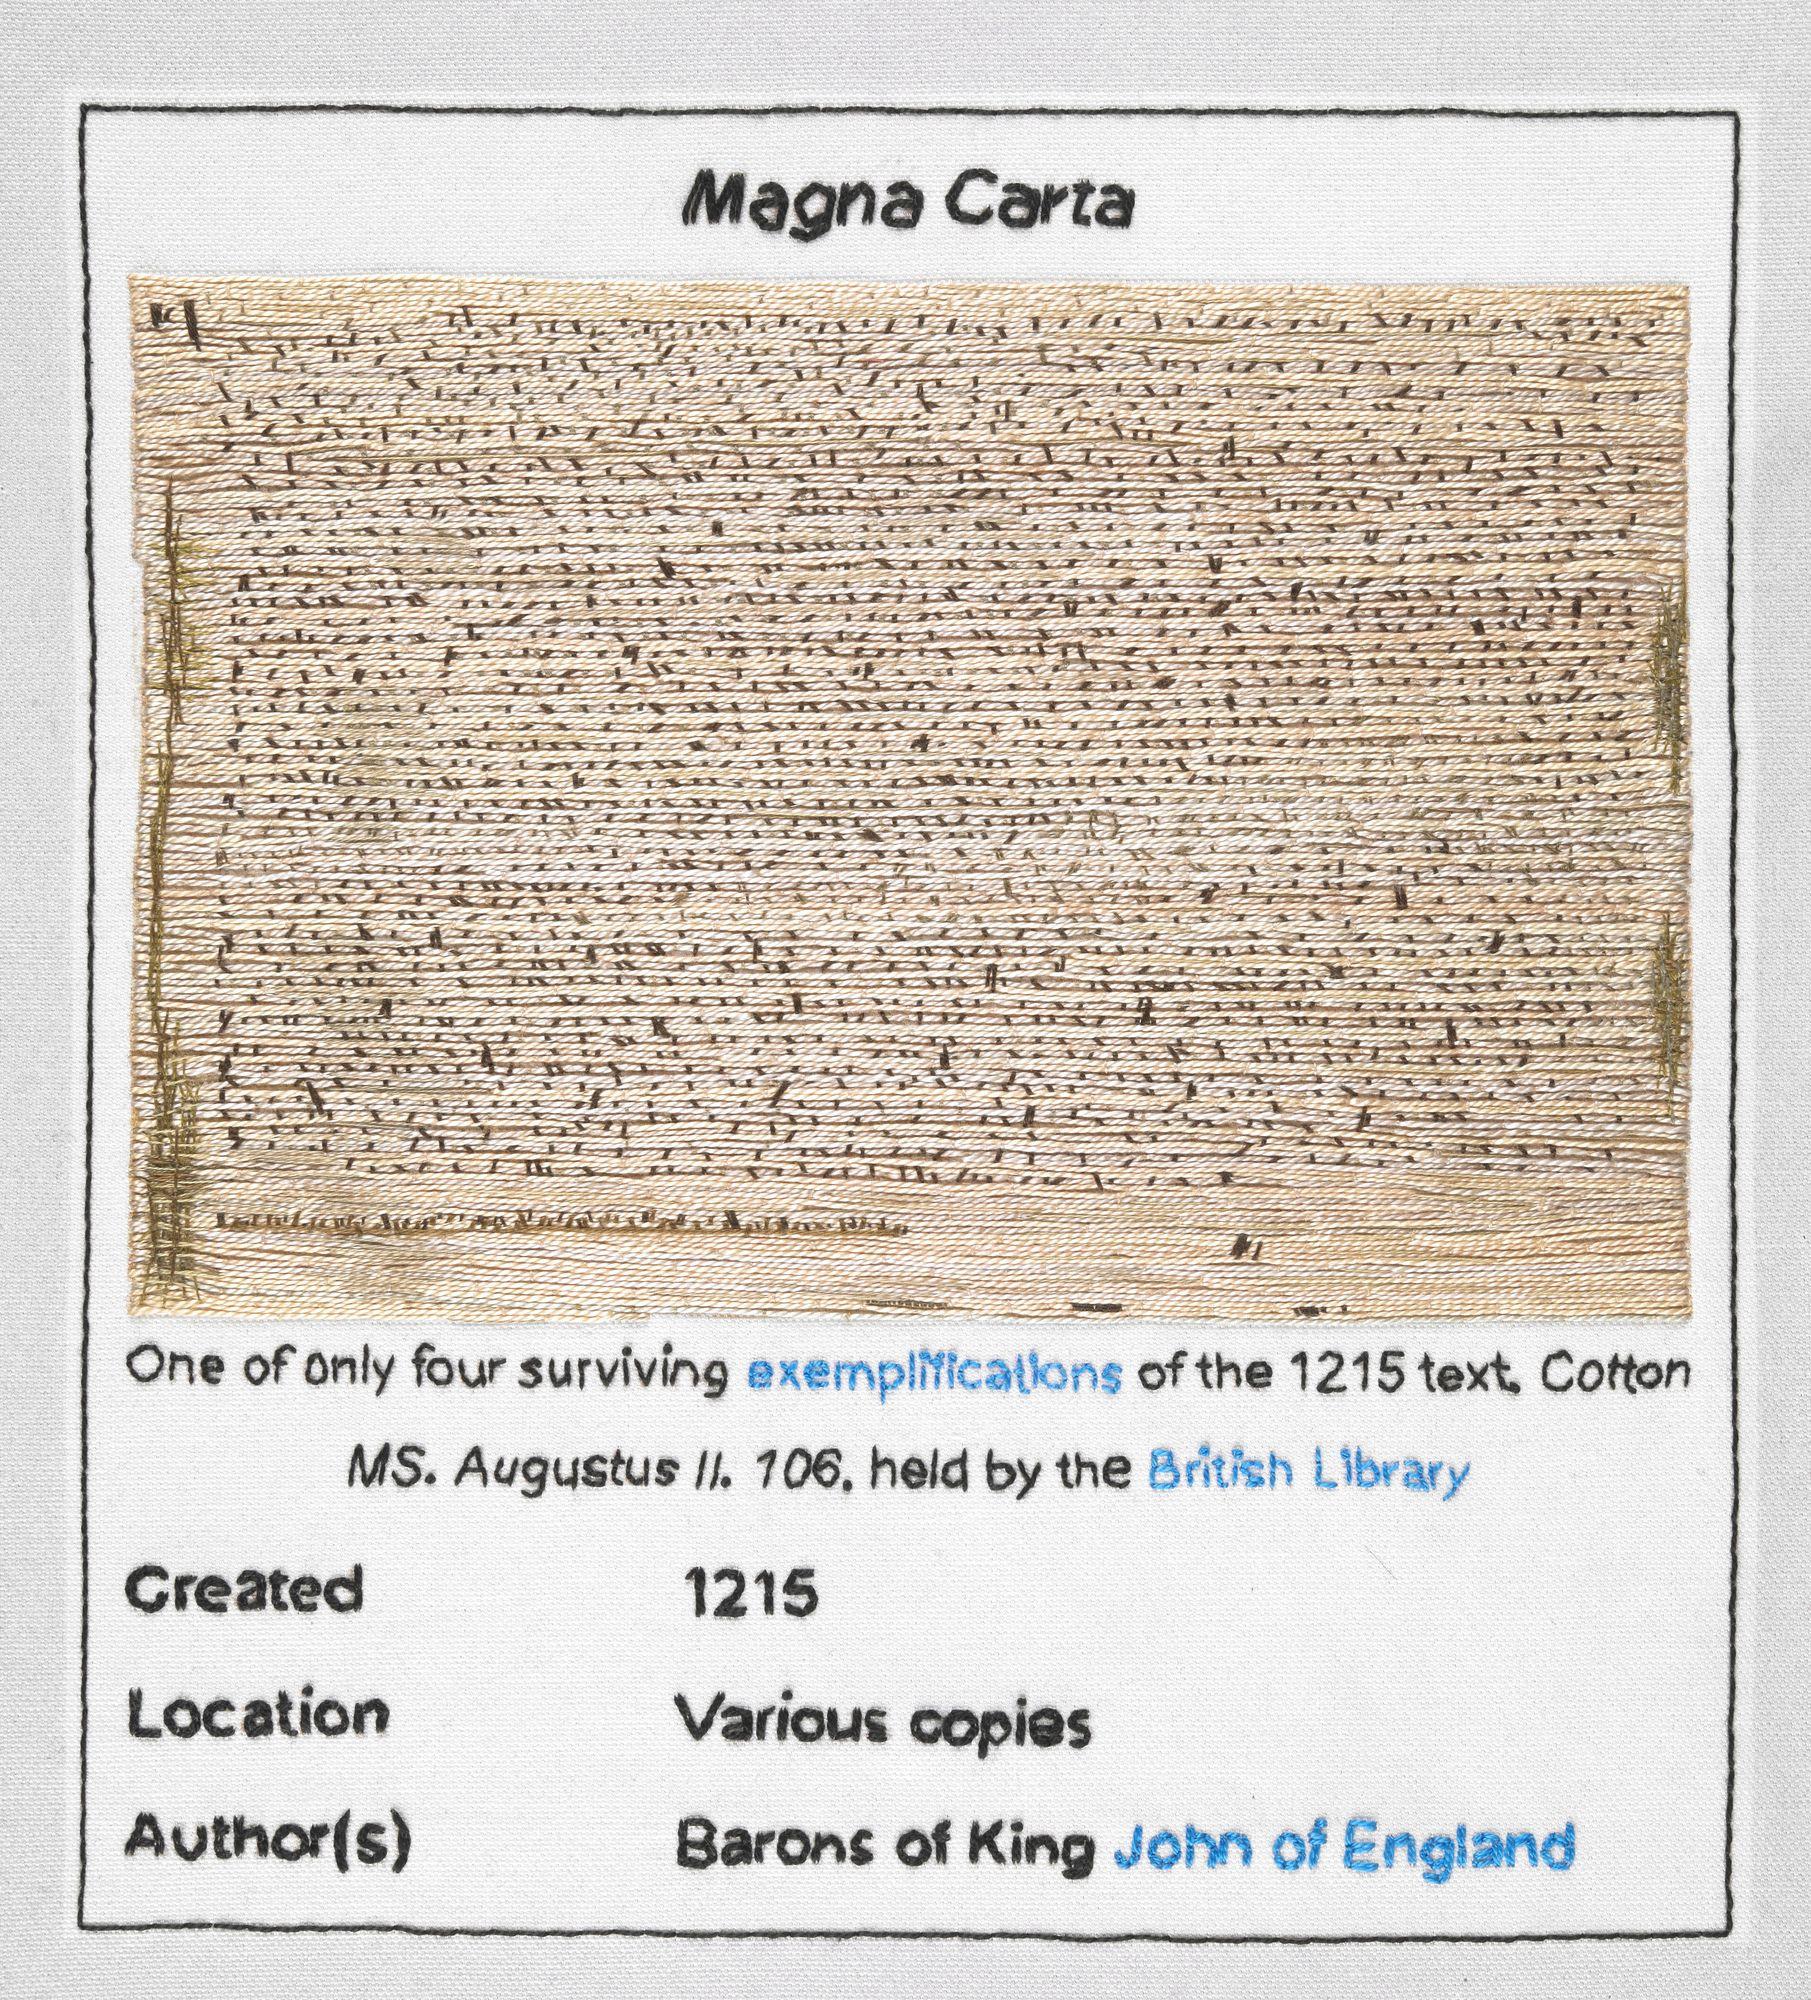 1215-magna-carta-detail-an-embroidery-cornelia-parker- - Magna Carta PNG